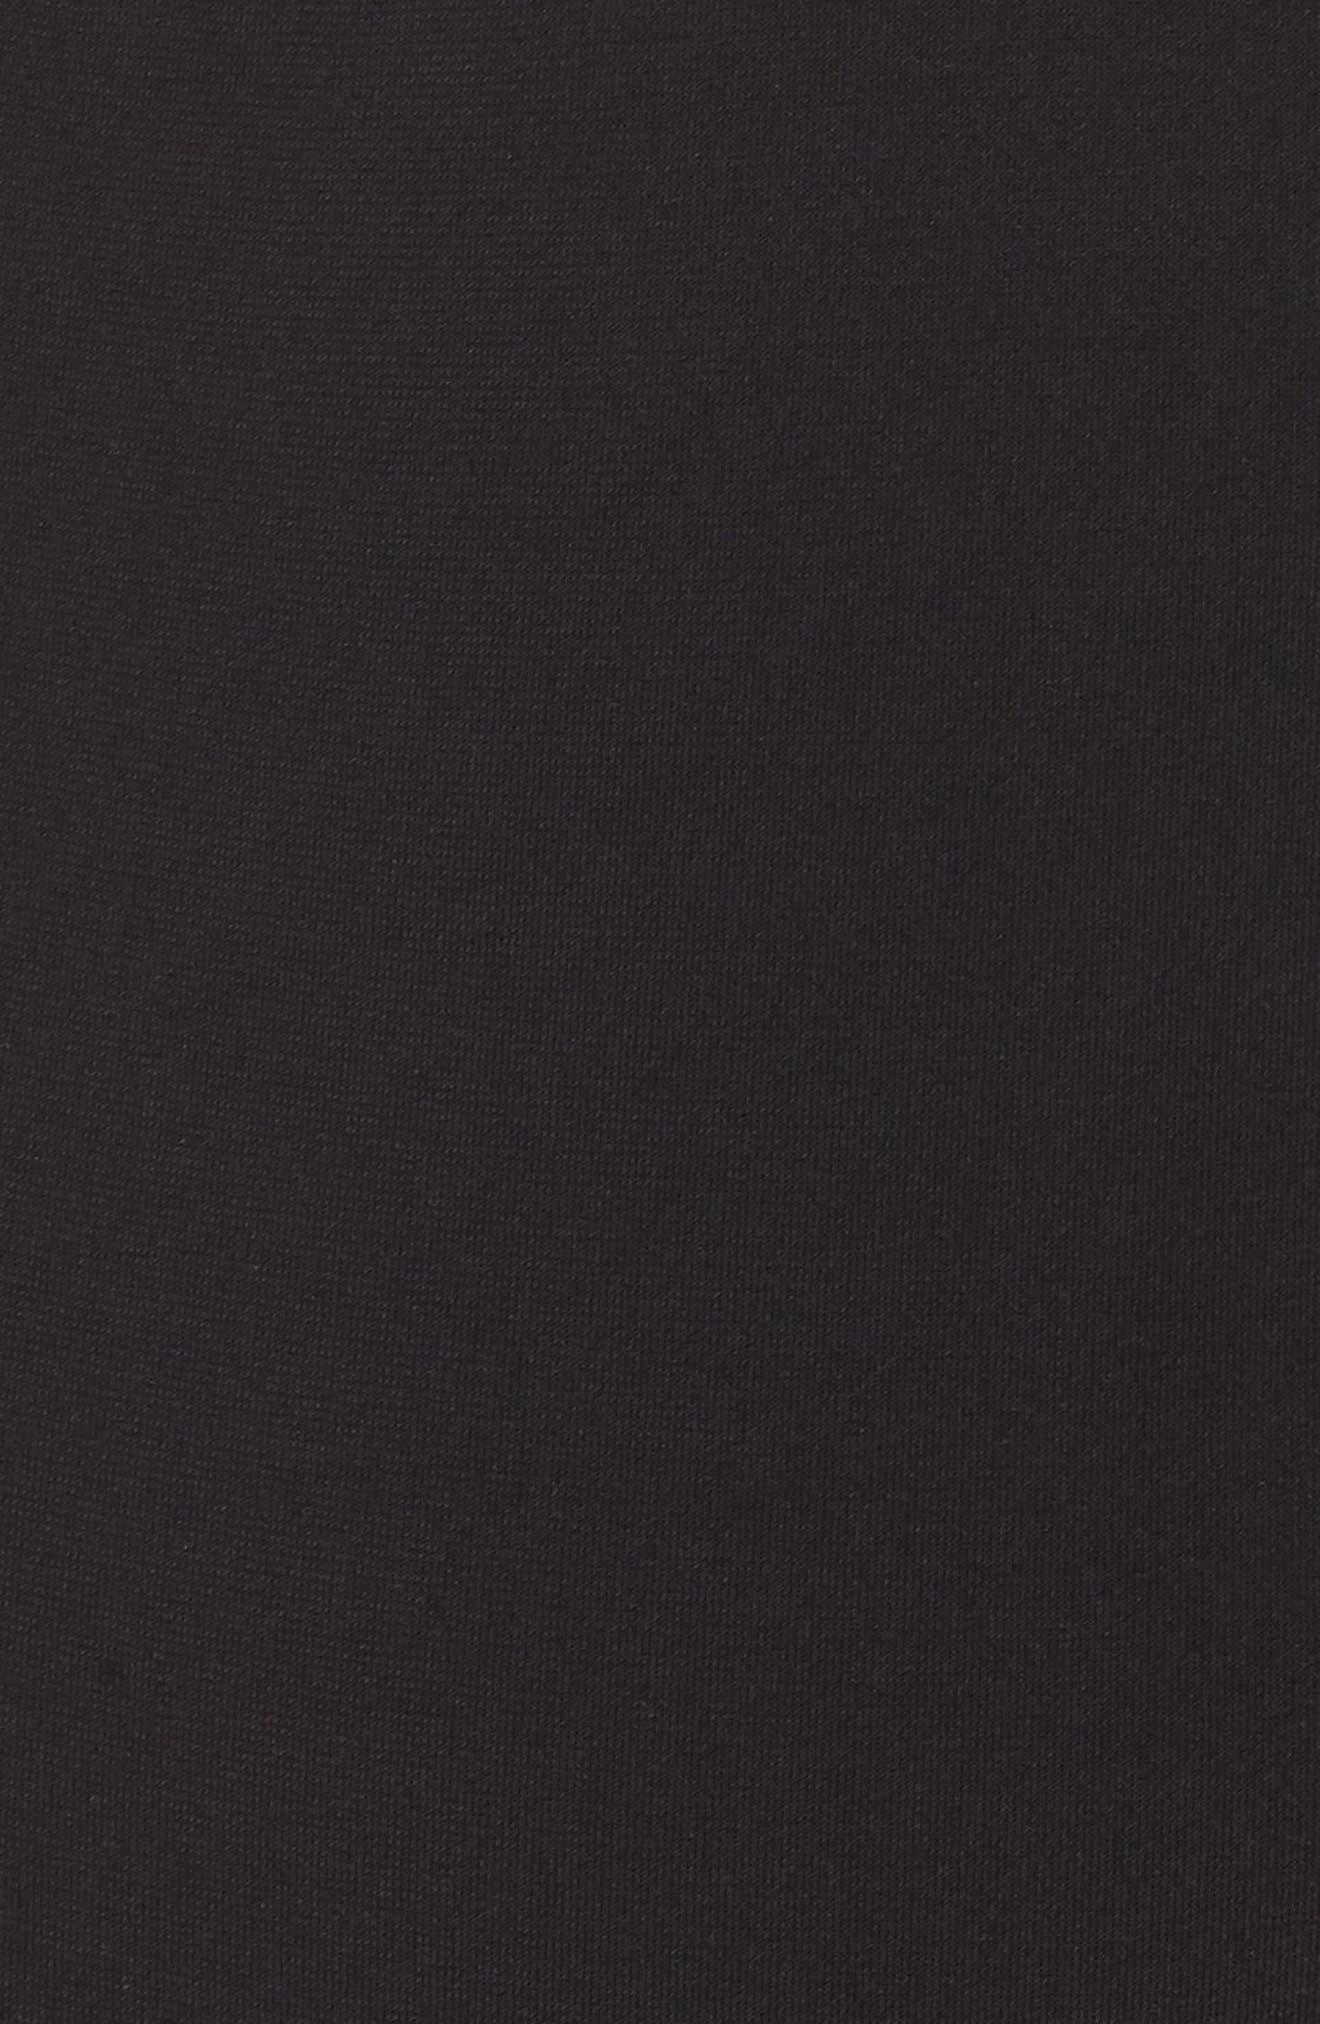 ROBIN PICCONE,                             Malia Ruffle One-Piece Swimsuit,                             Alternate thumbnail 5, color,                             BLACK/ WHITE